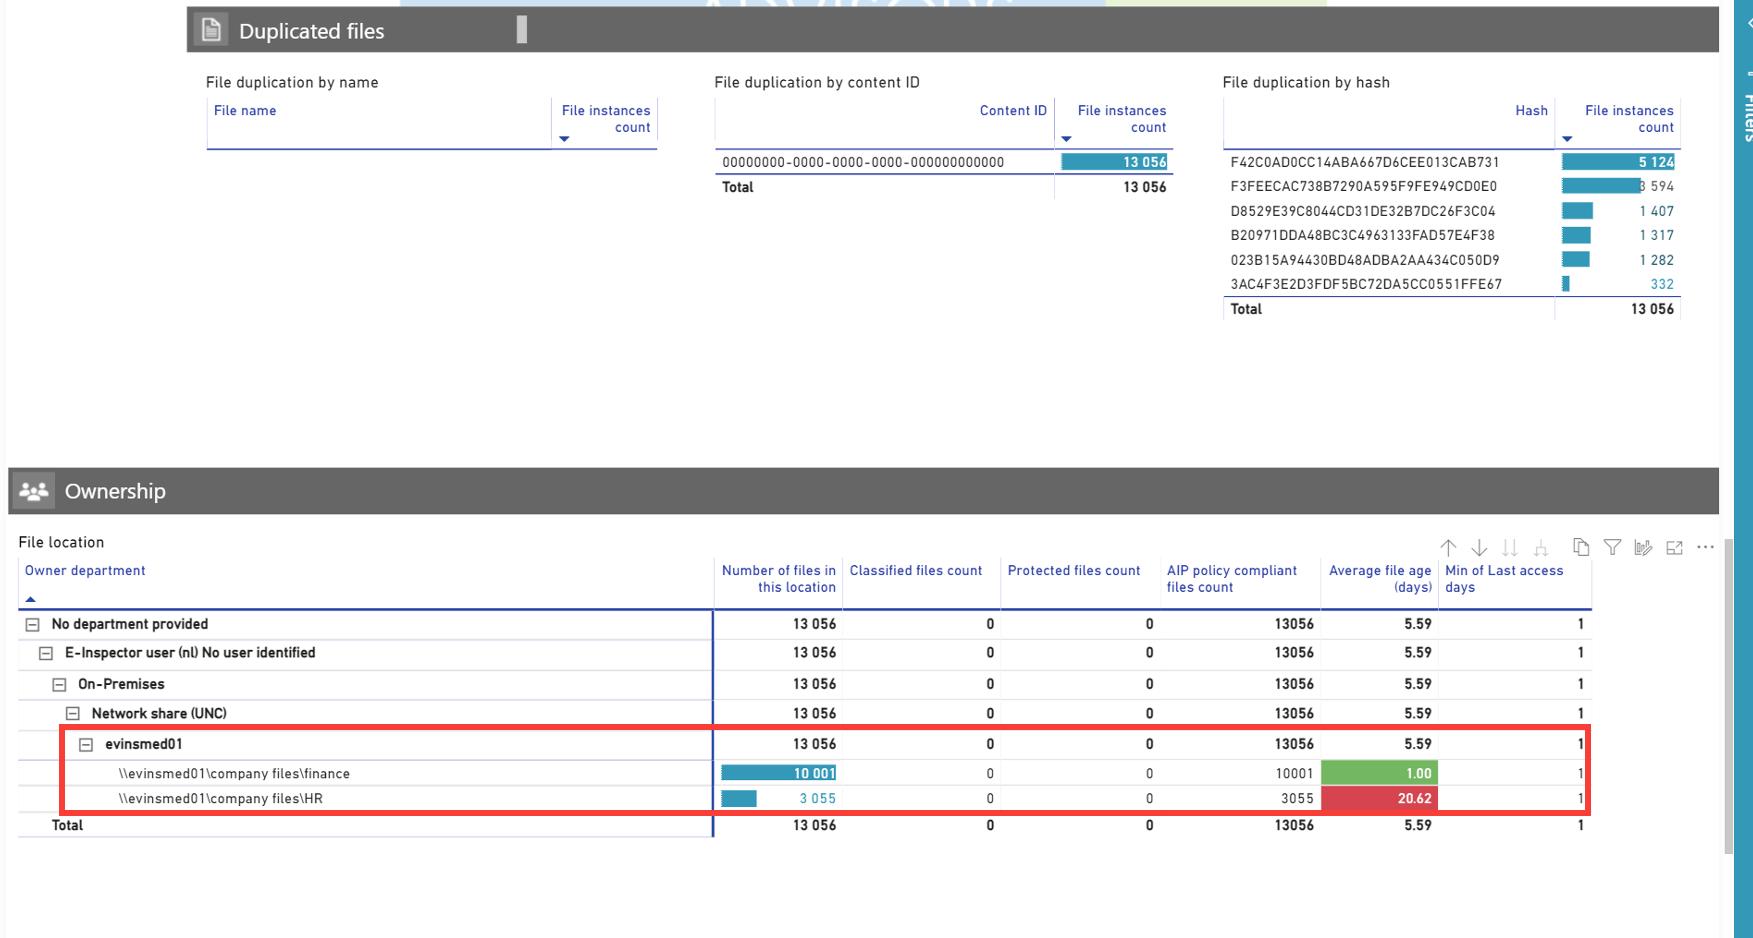 File location details